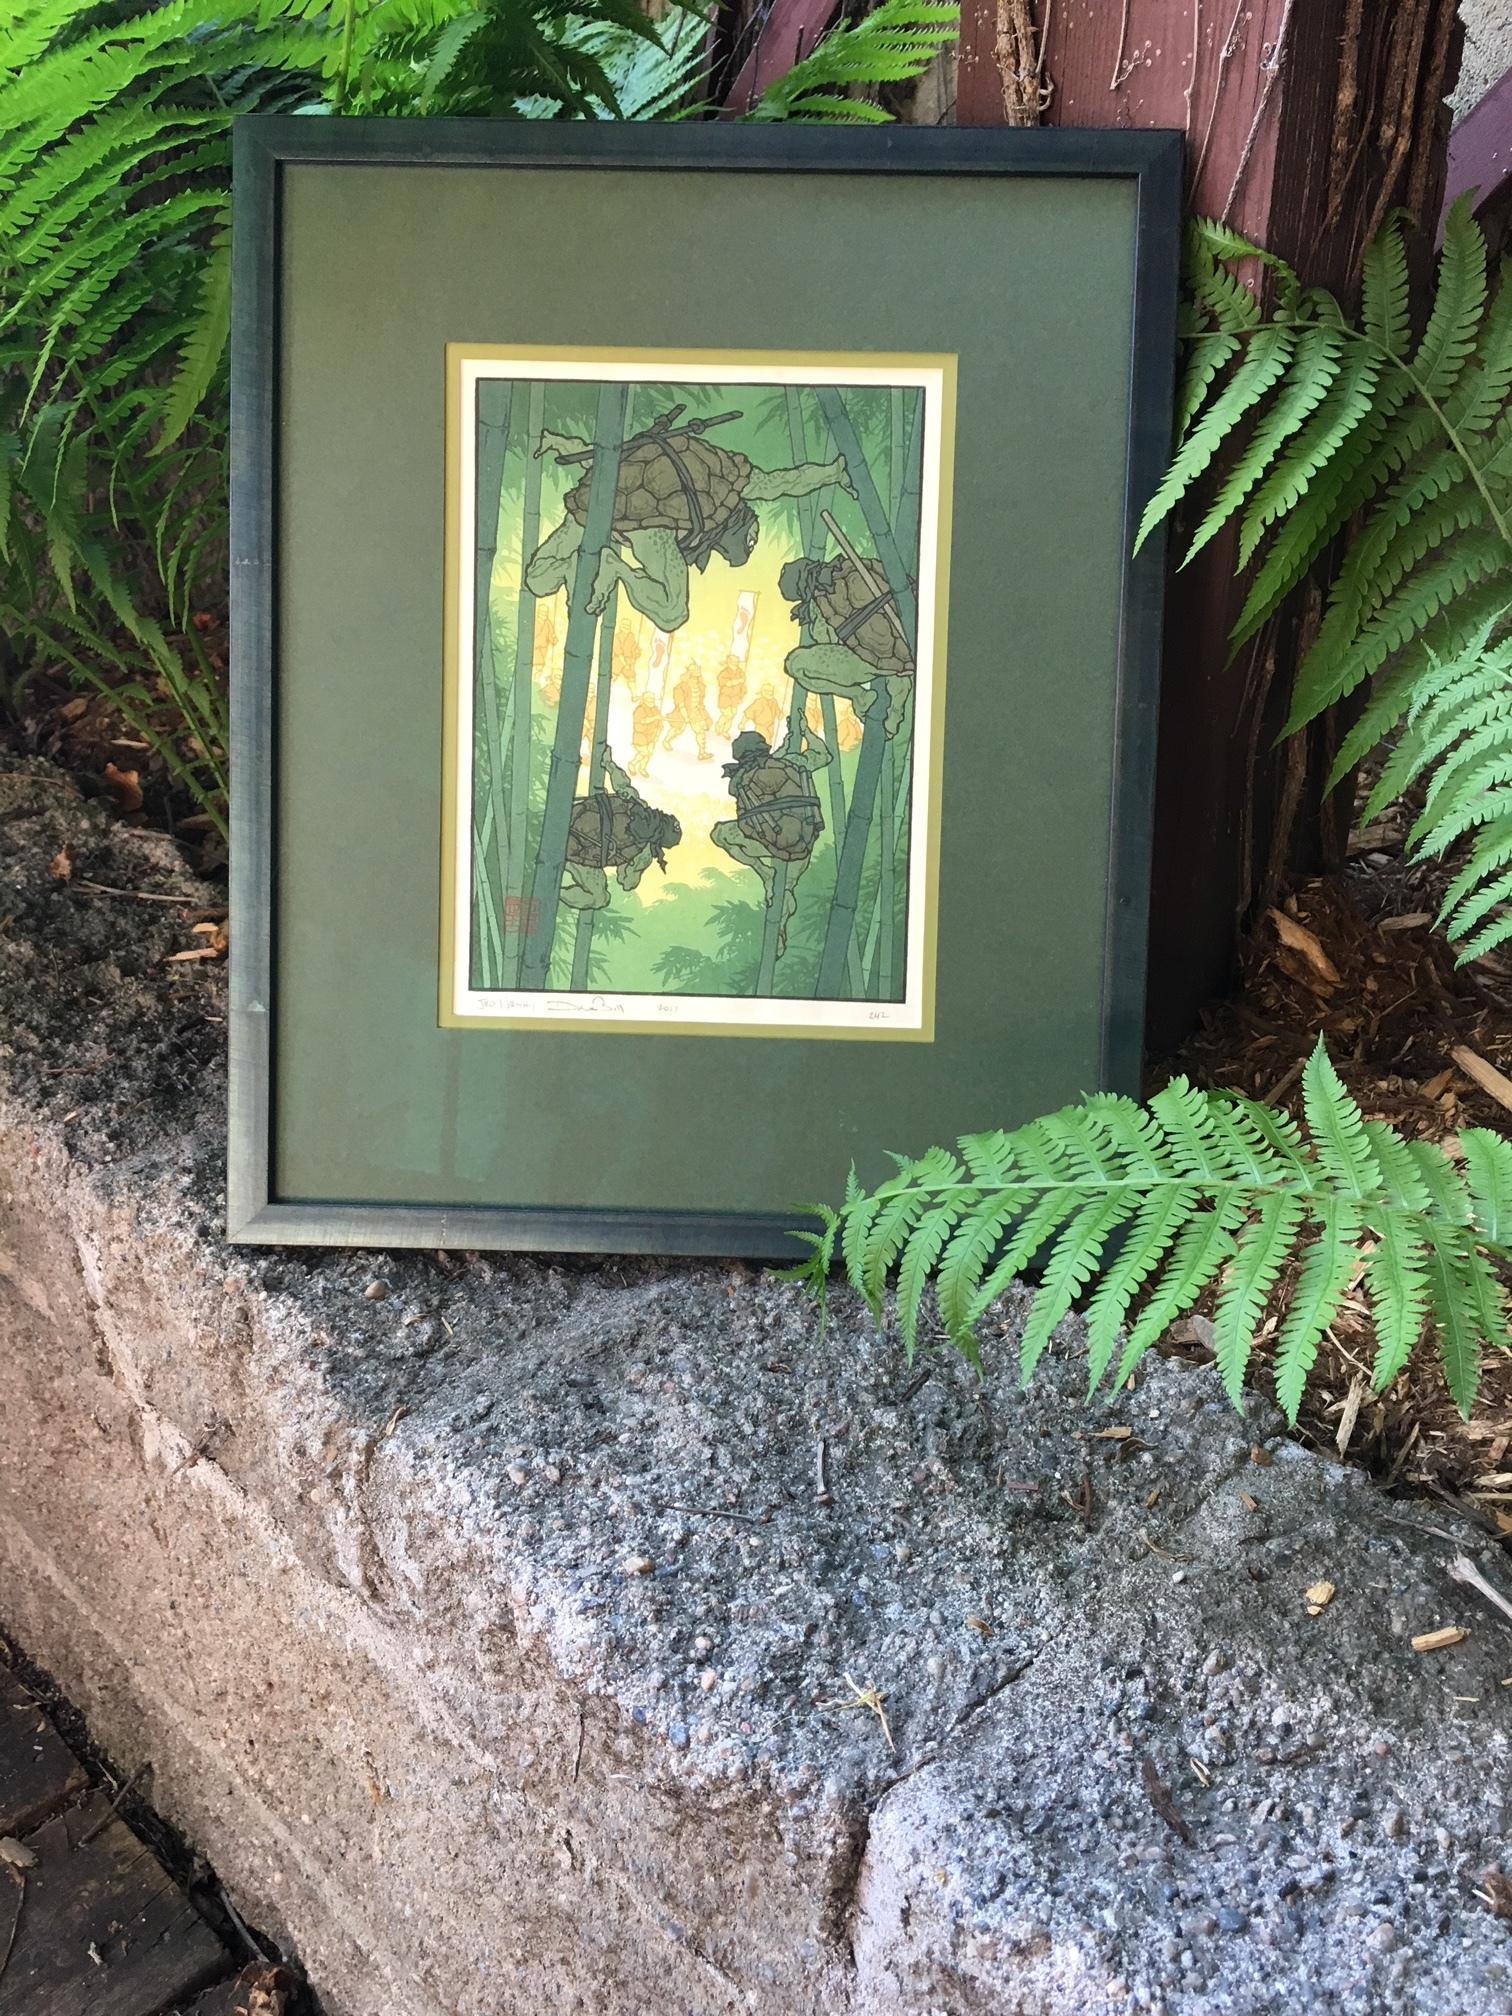 Ninja turtles print framed in oxidized green frame.